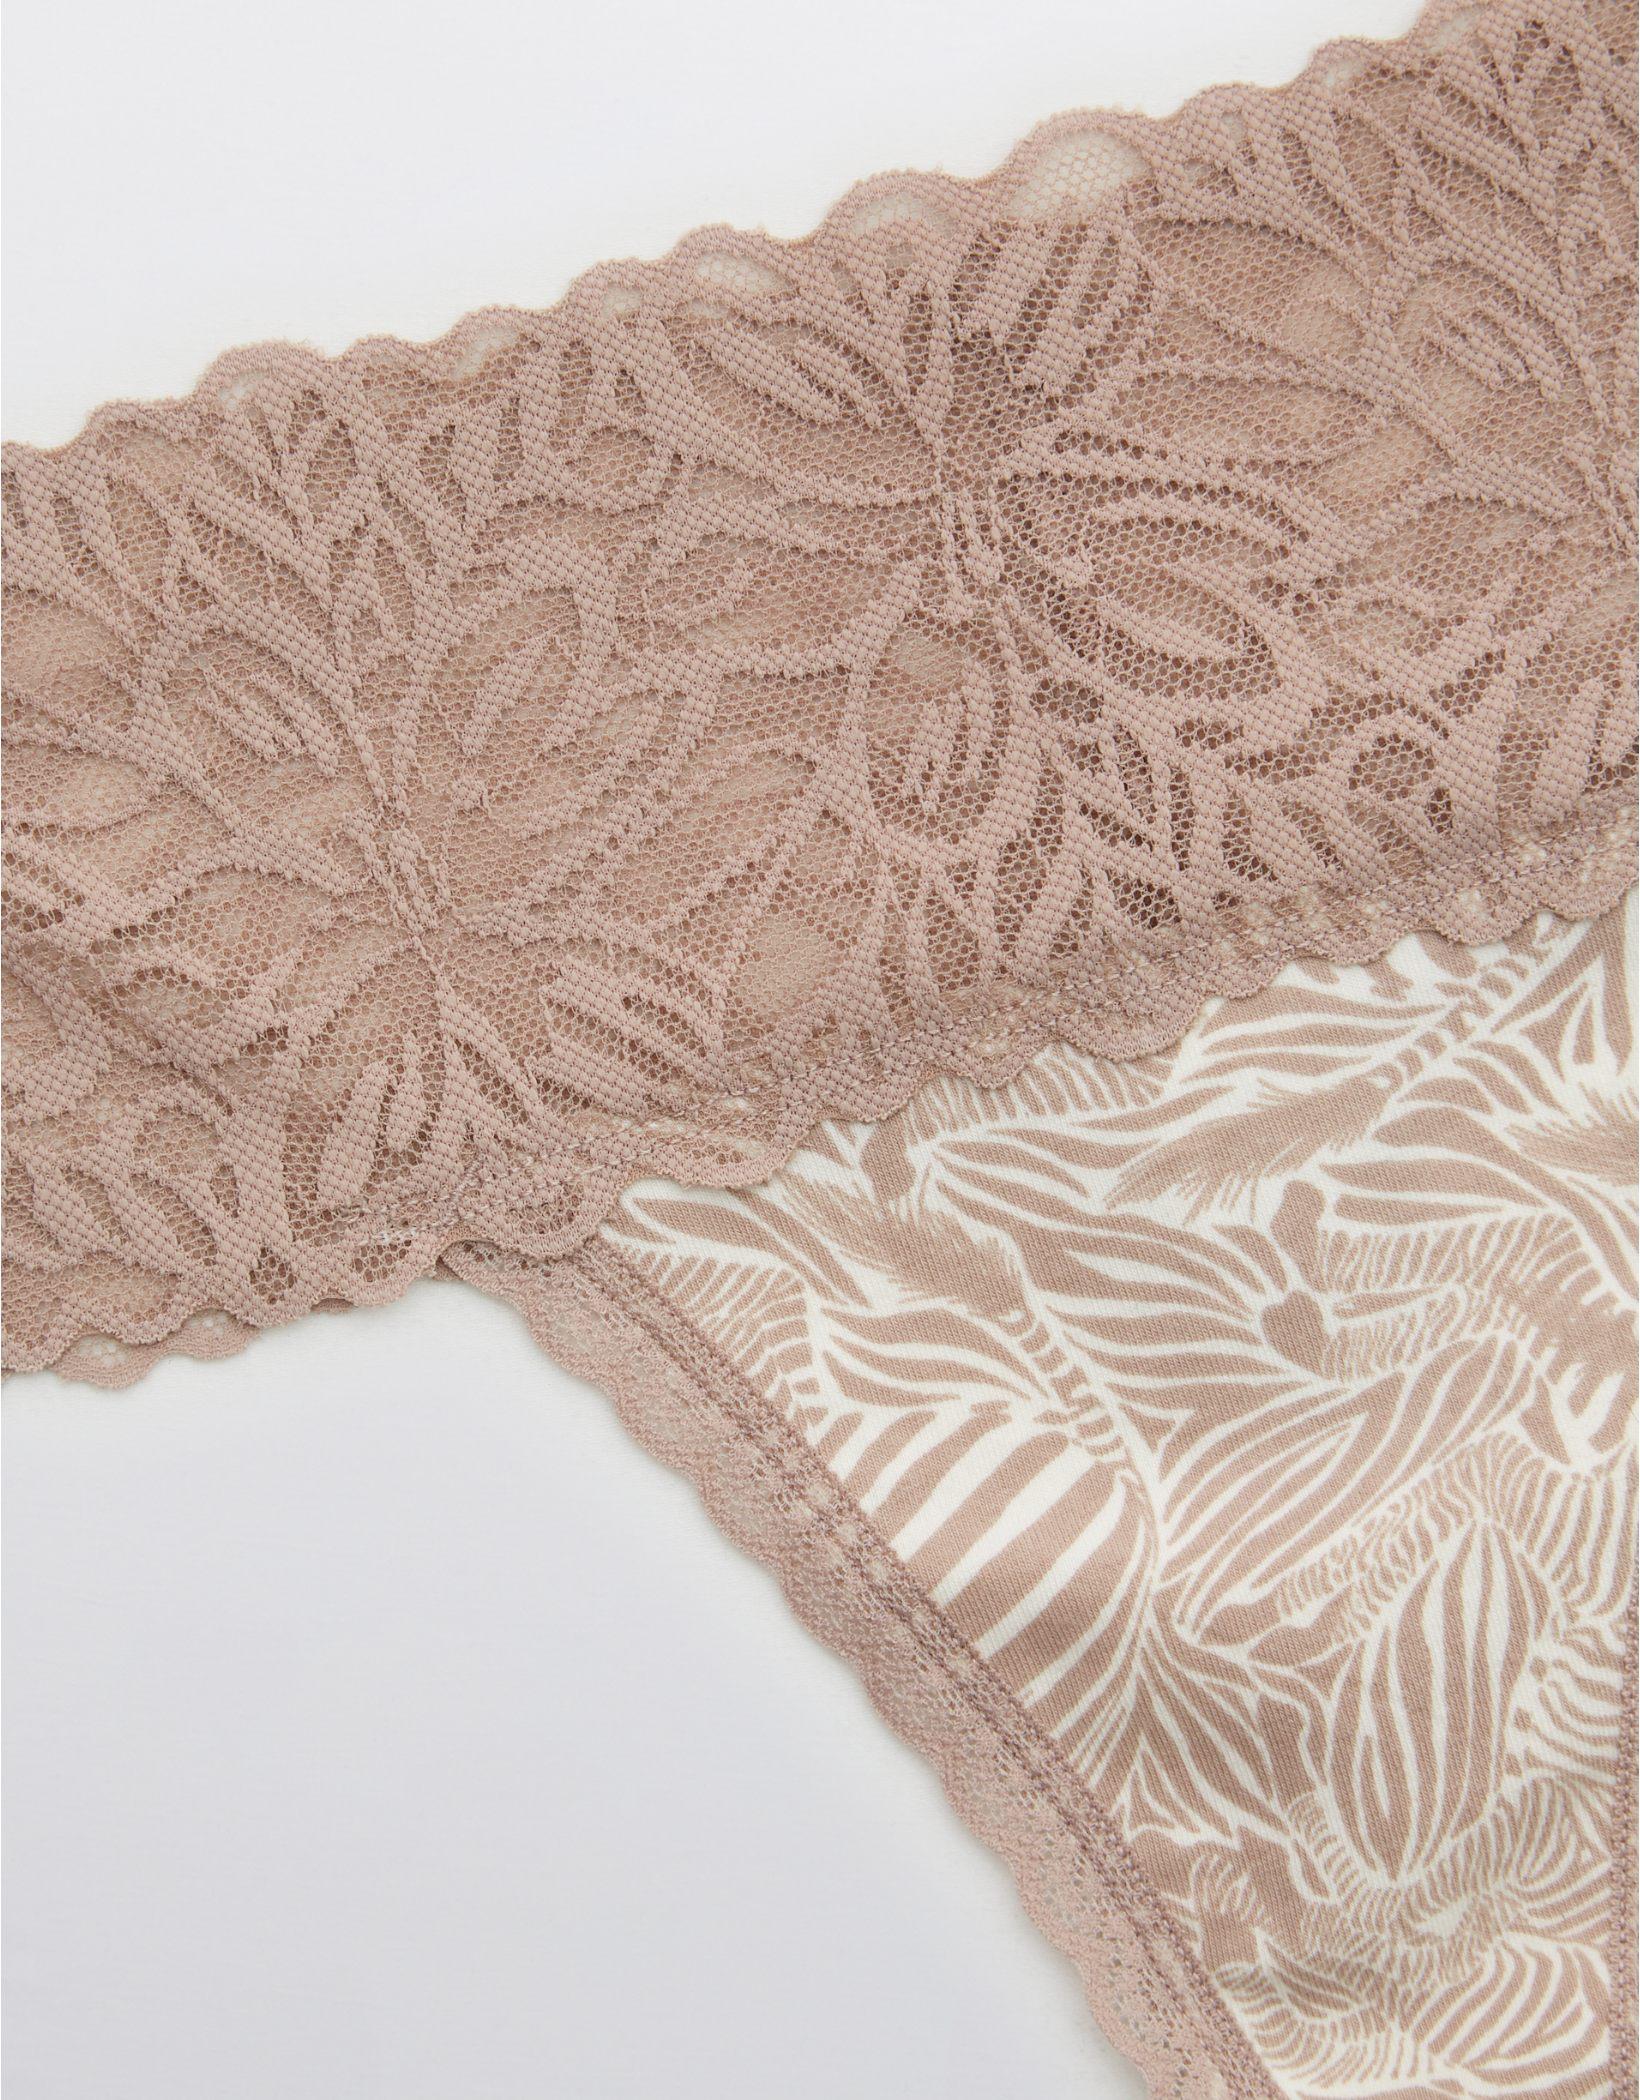 Aerie Cotton Firework Lace Printed Thong Underwear